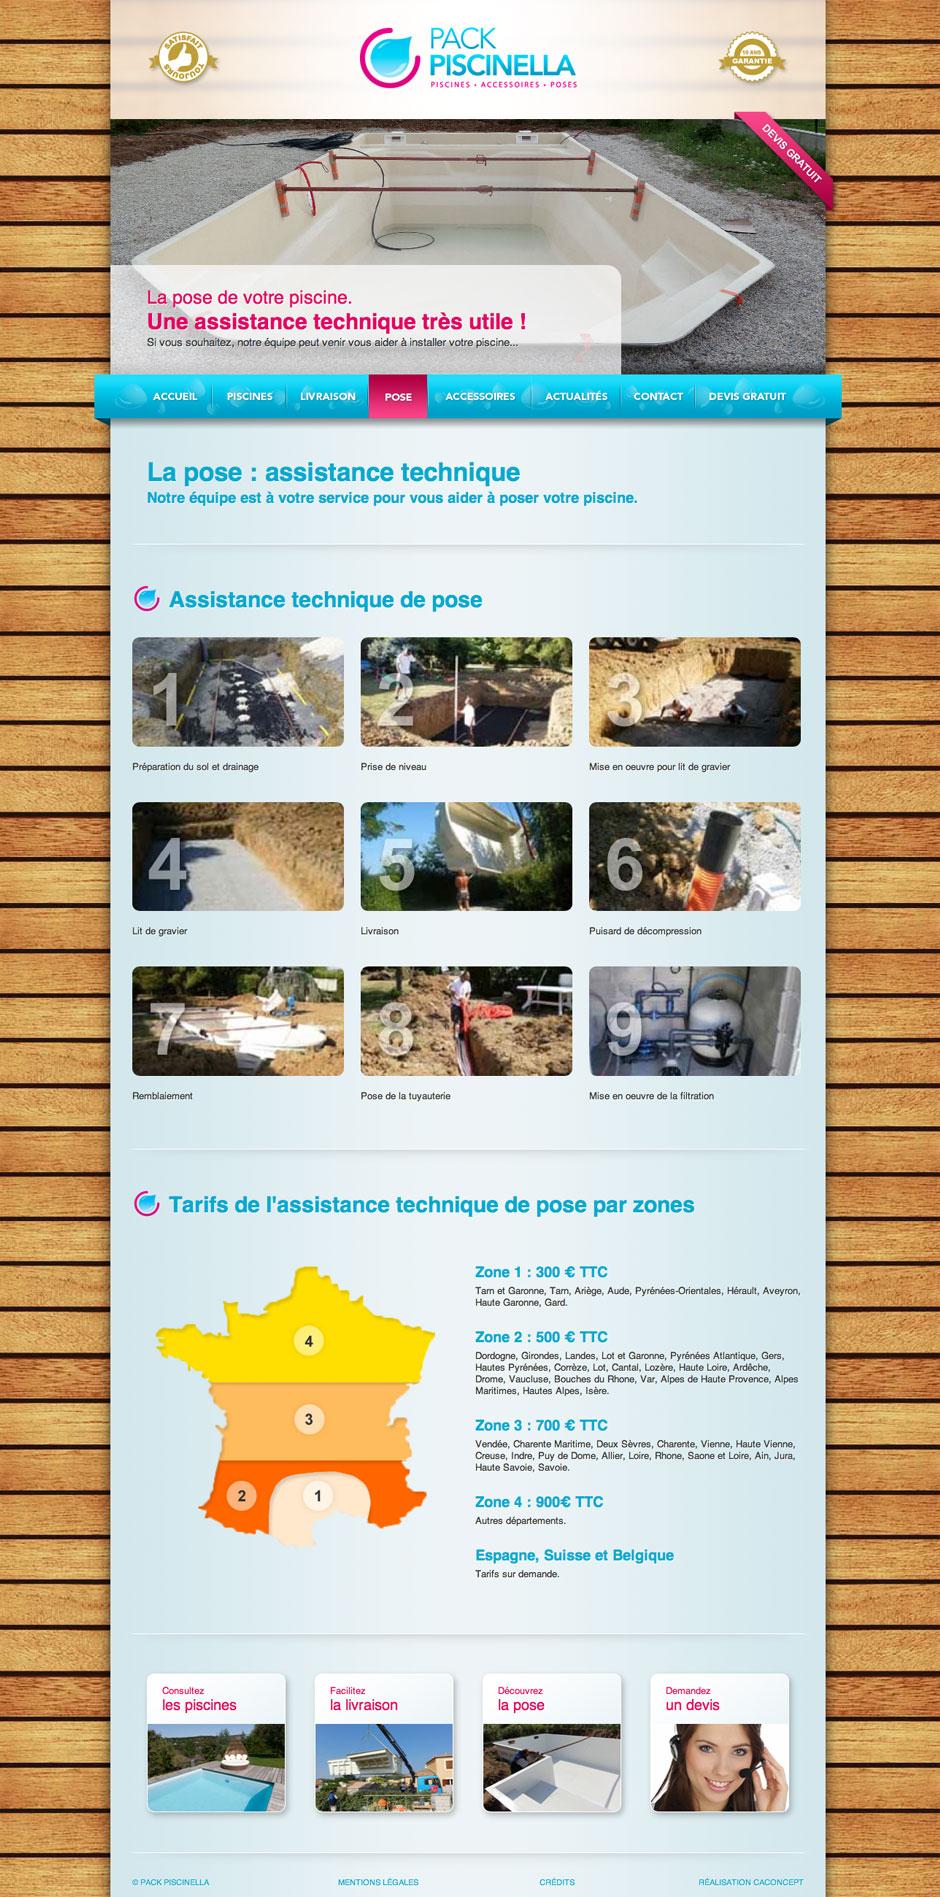 graphiste-montpellier-creation-pack-piscinella-agence-communication-montpellier-caconcept-alexis-cretin-6